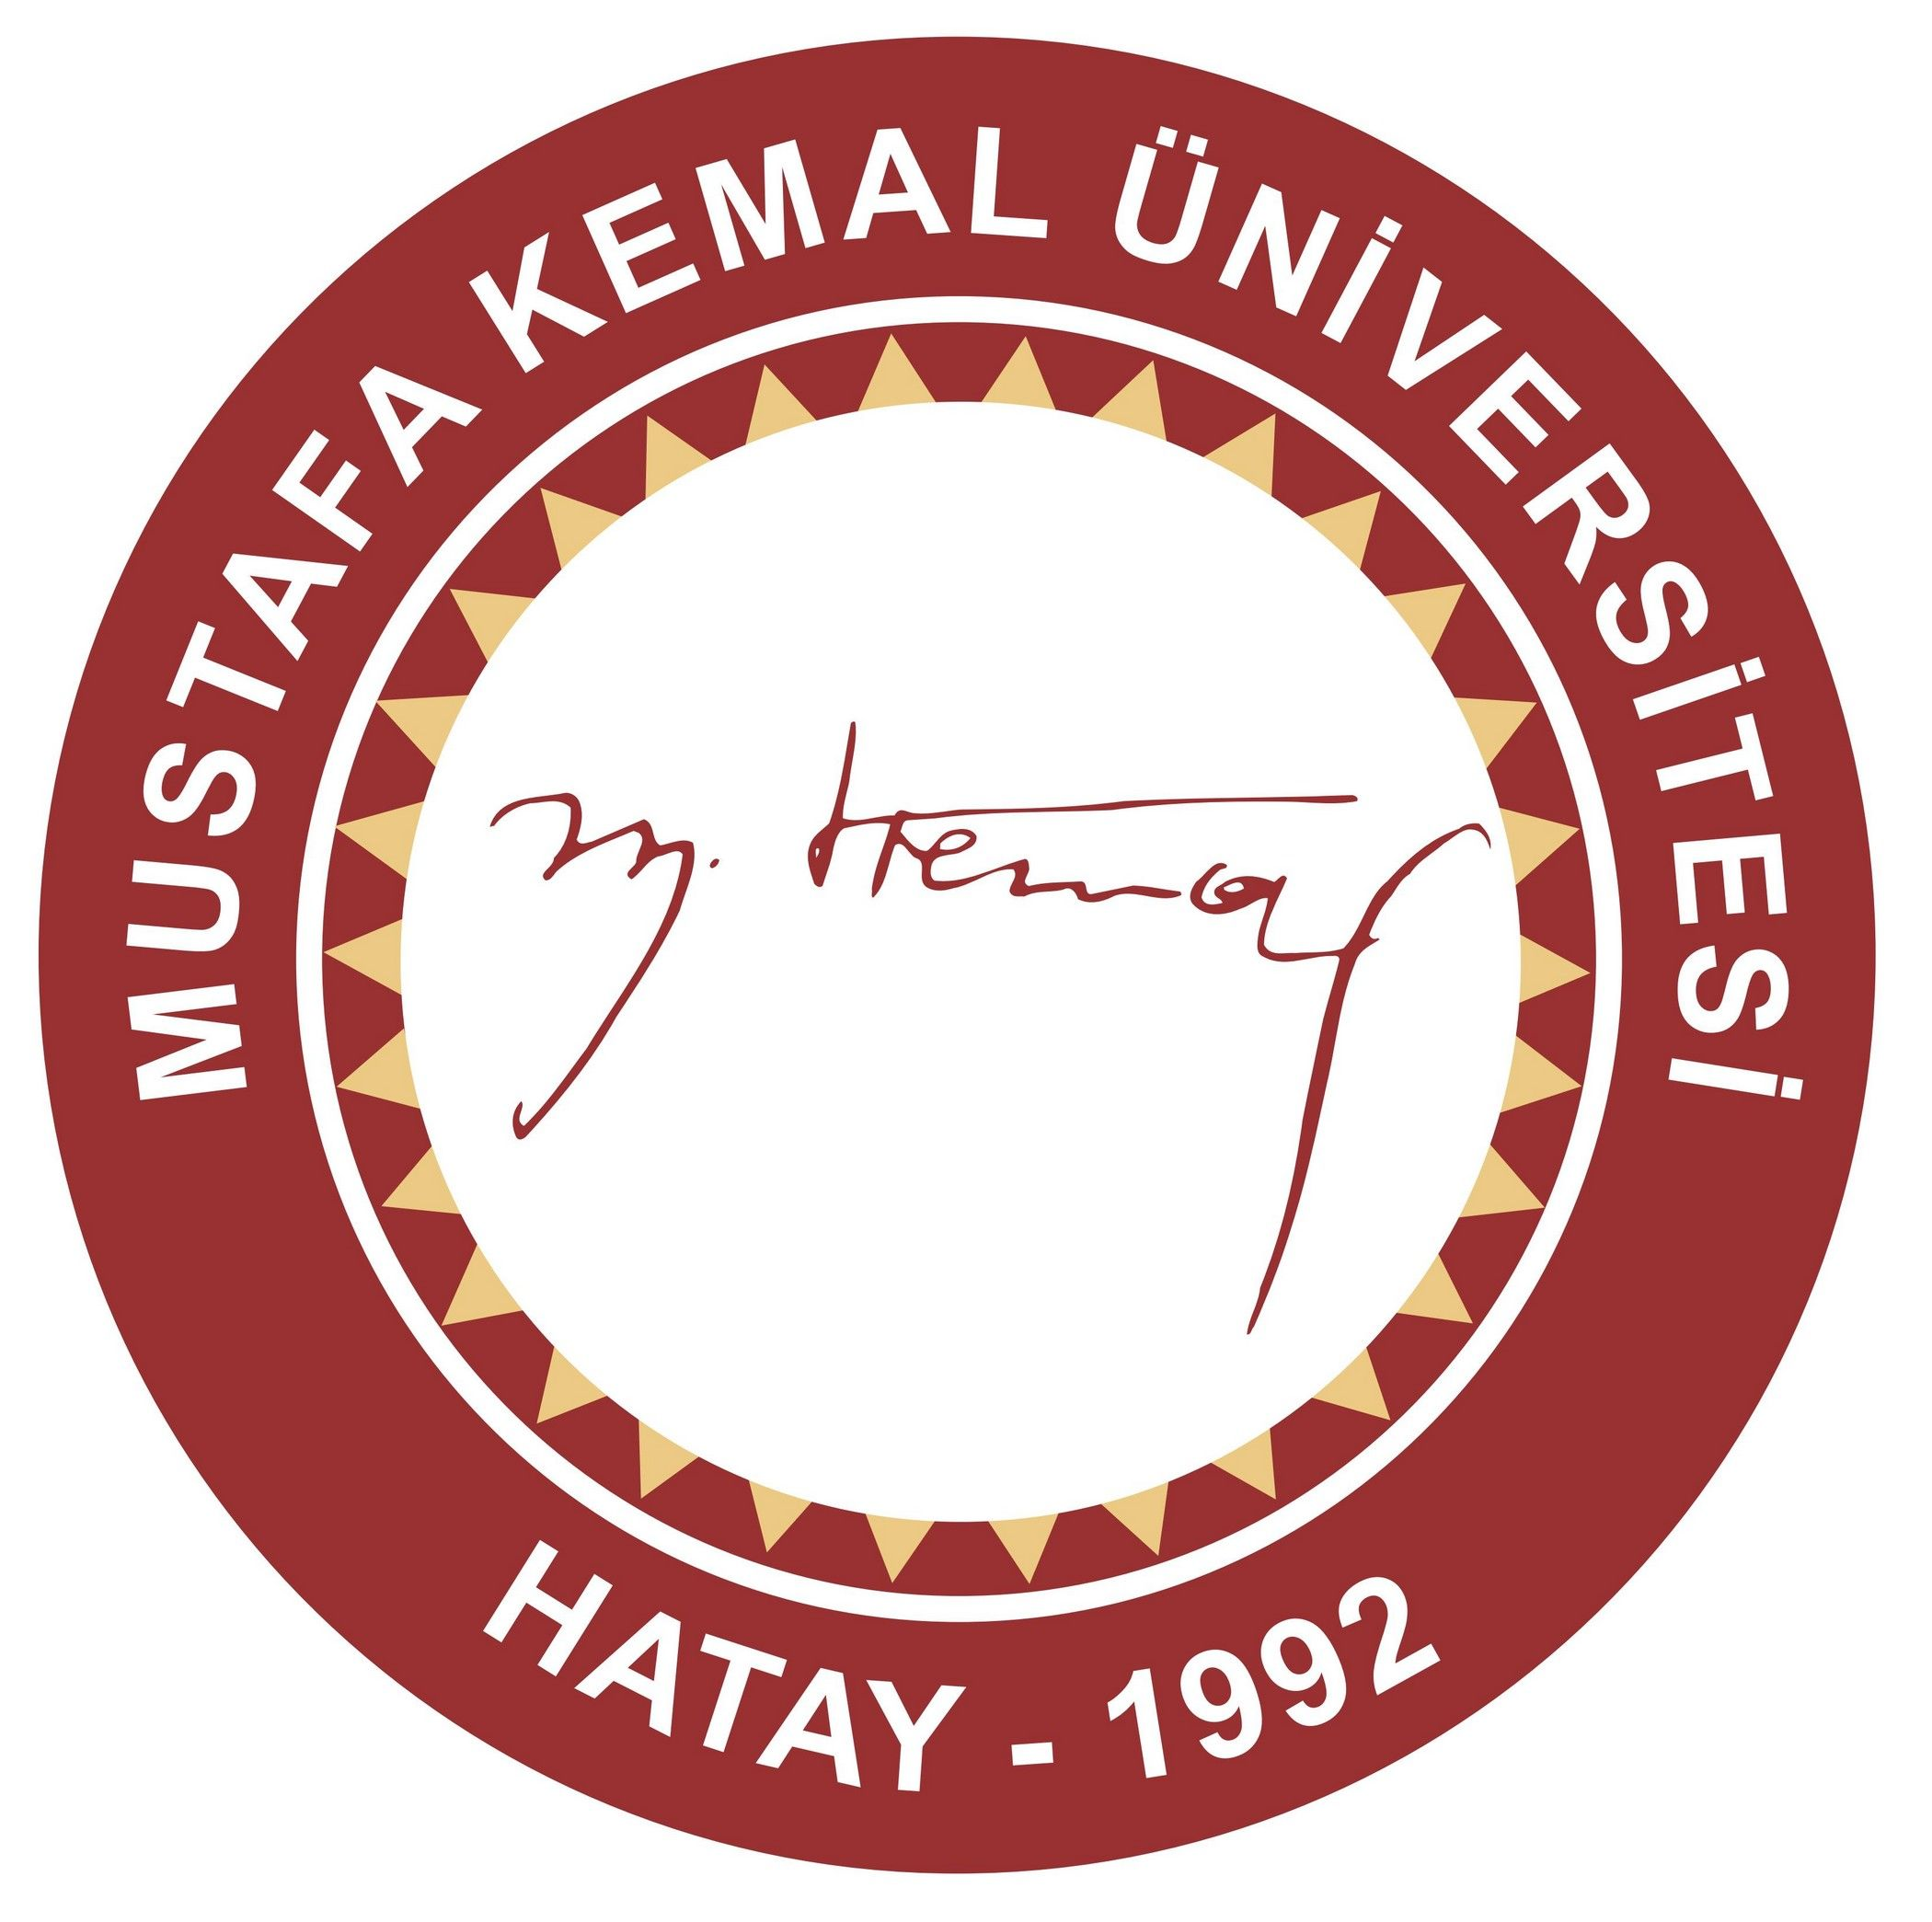 MKÜ Mustafa Kemal Üniversitesi (Hatay) Logo [mku.edu.tr